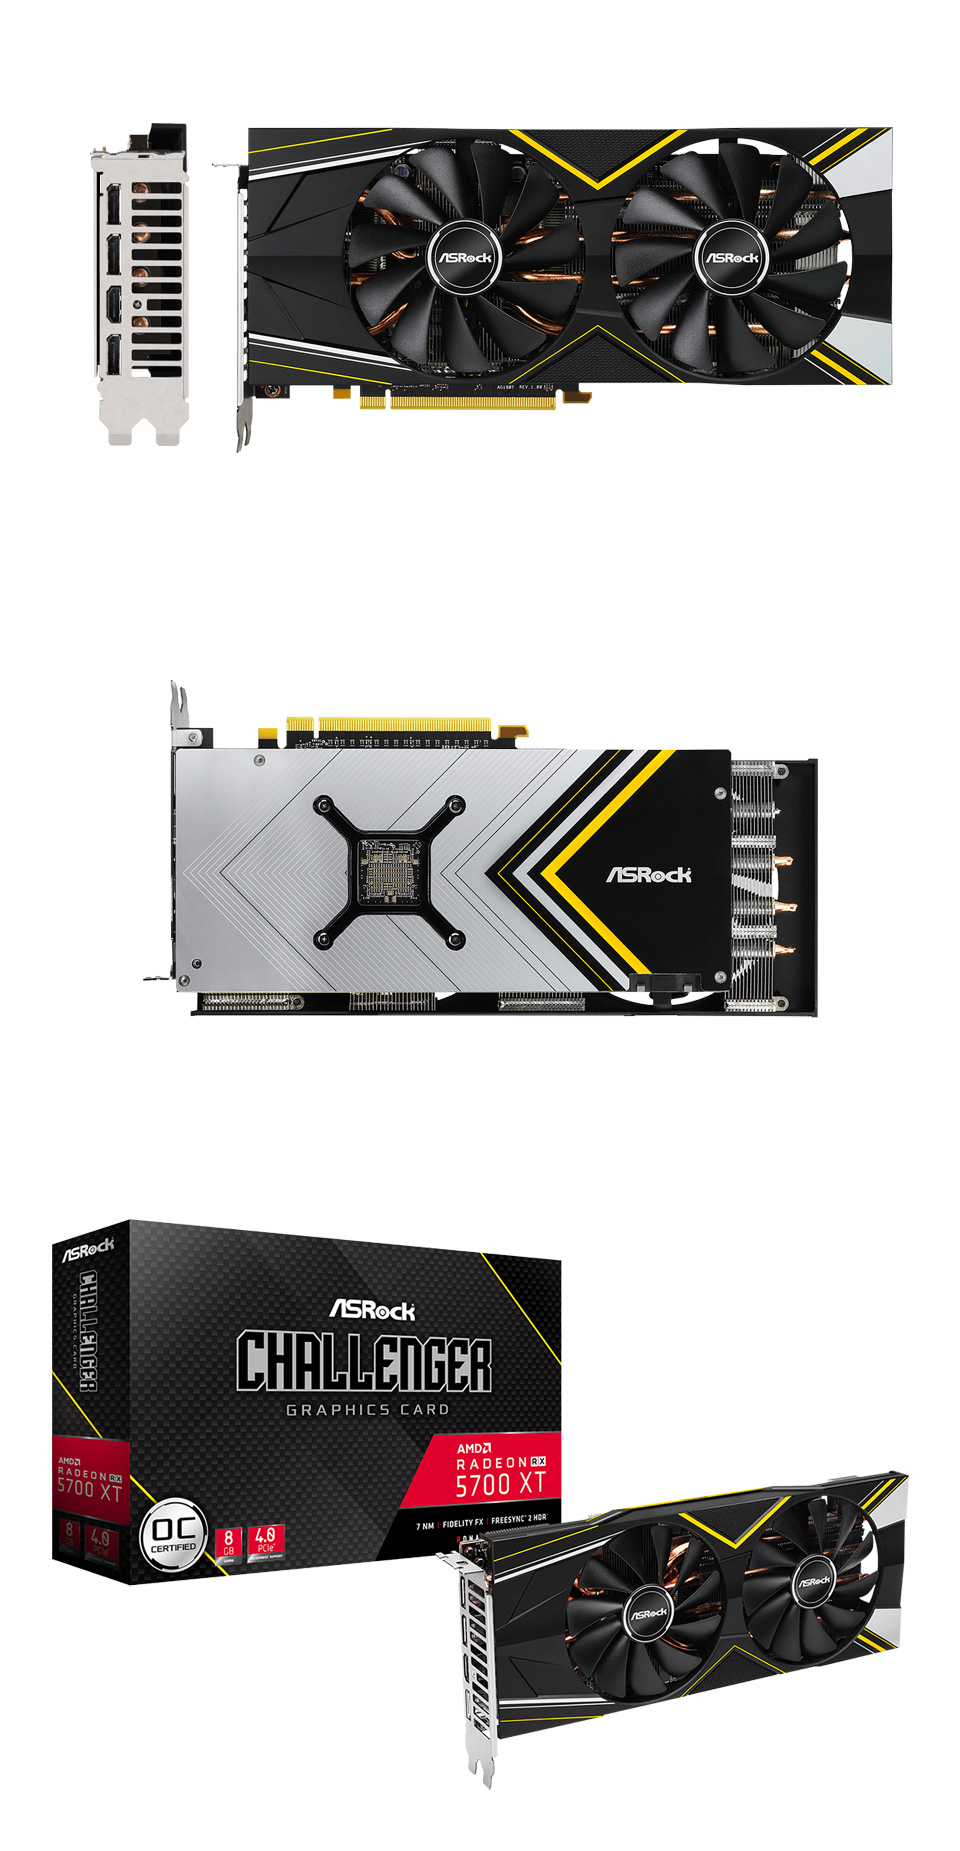 ASRock Challenger D Radeon RX 5700 XT 8GB product